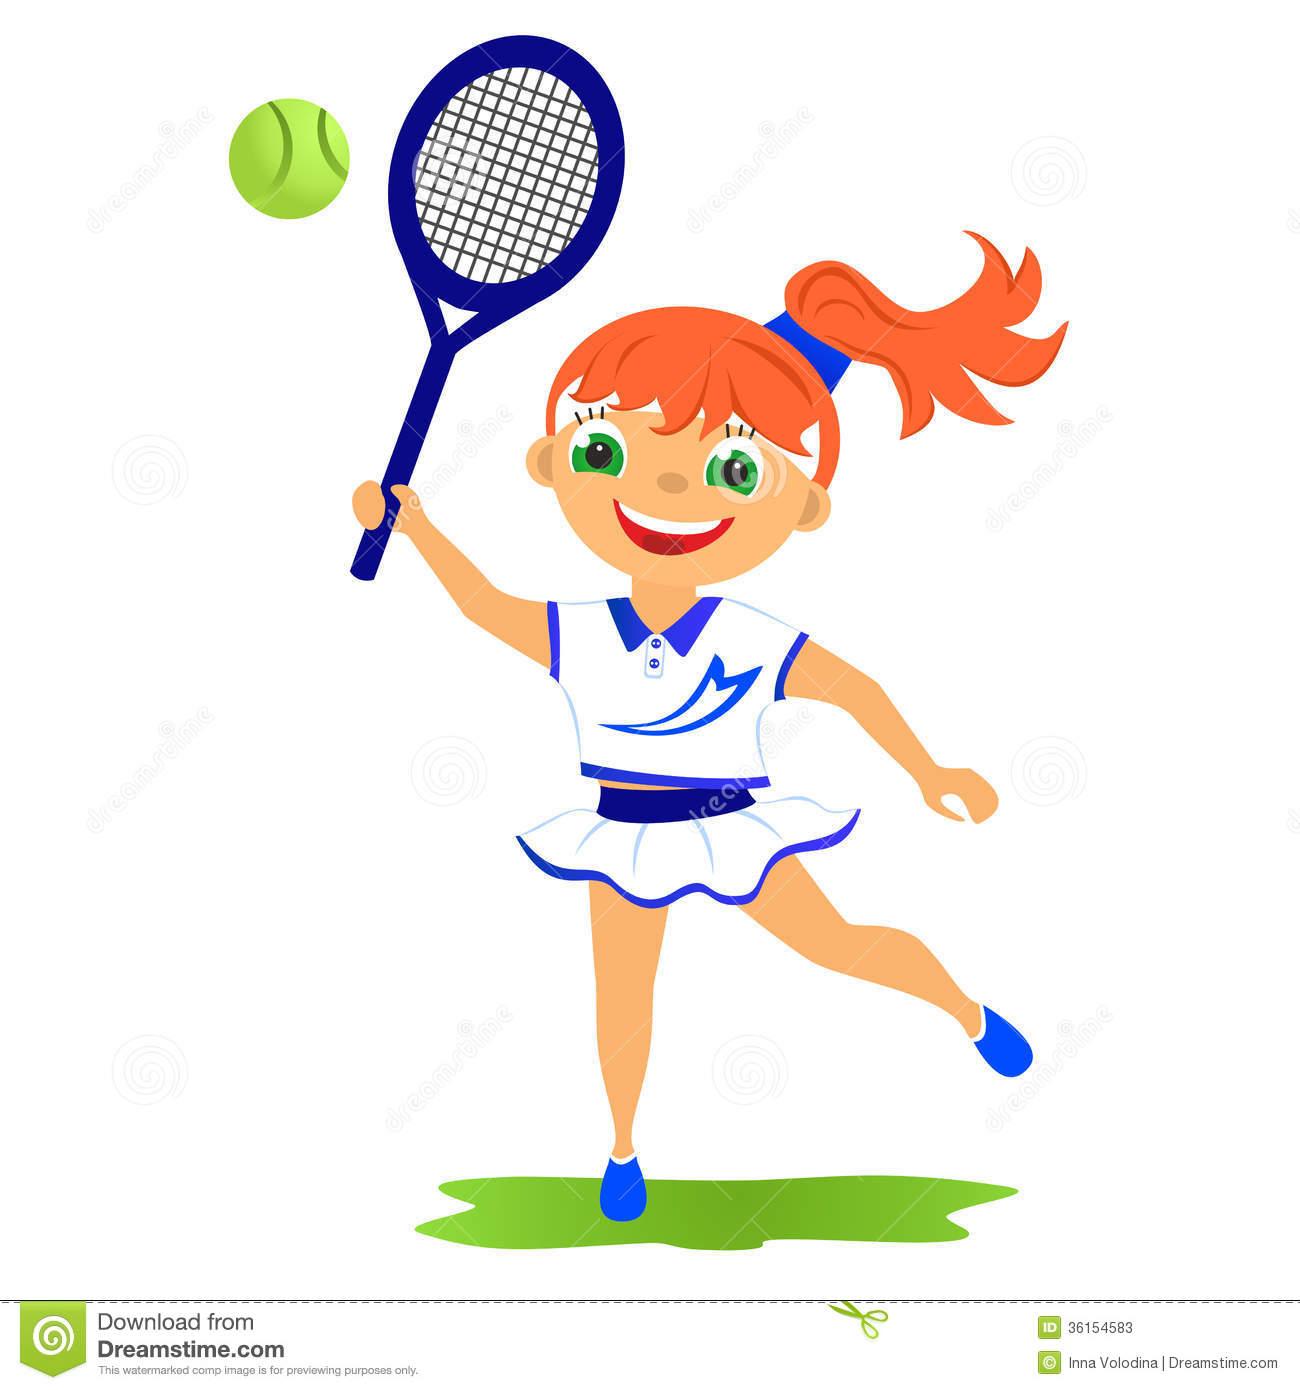 clipart sport tennis - photo #27